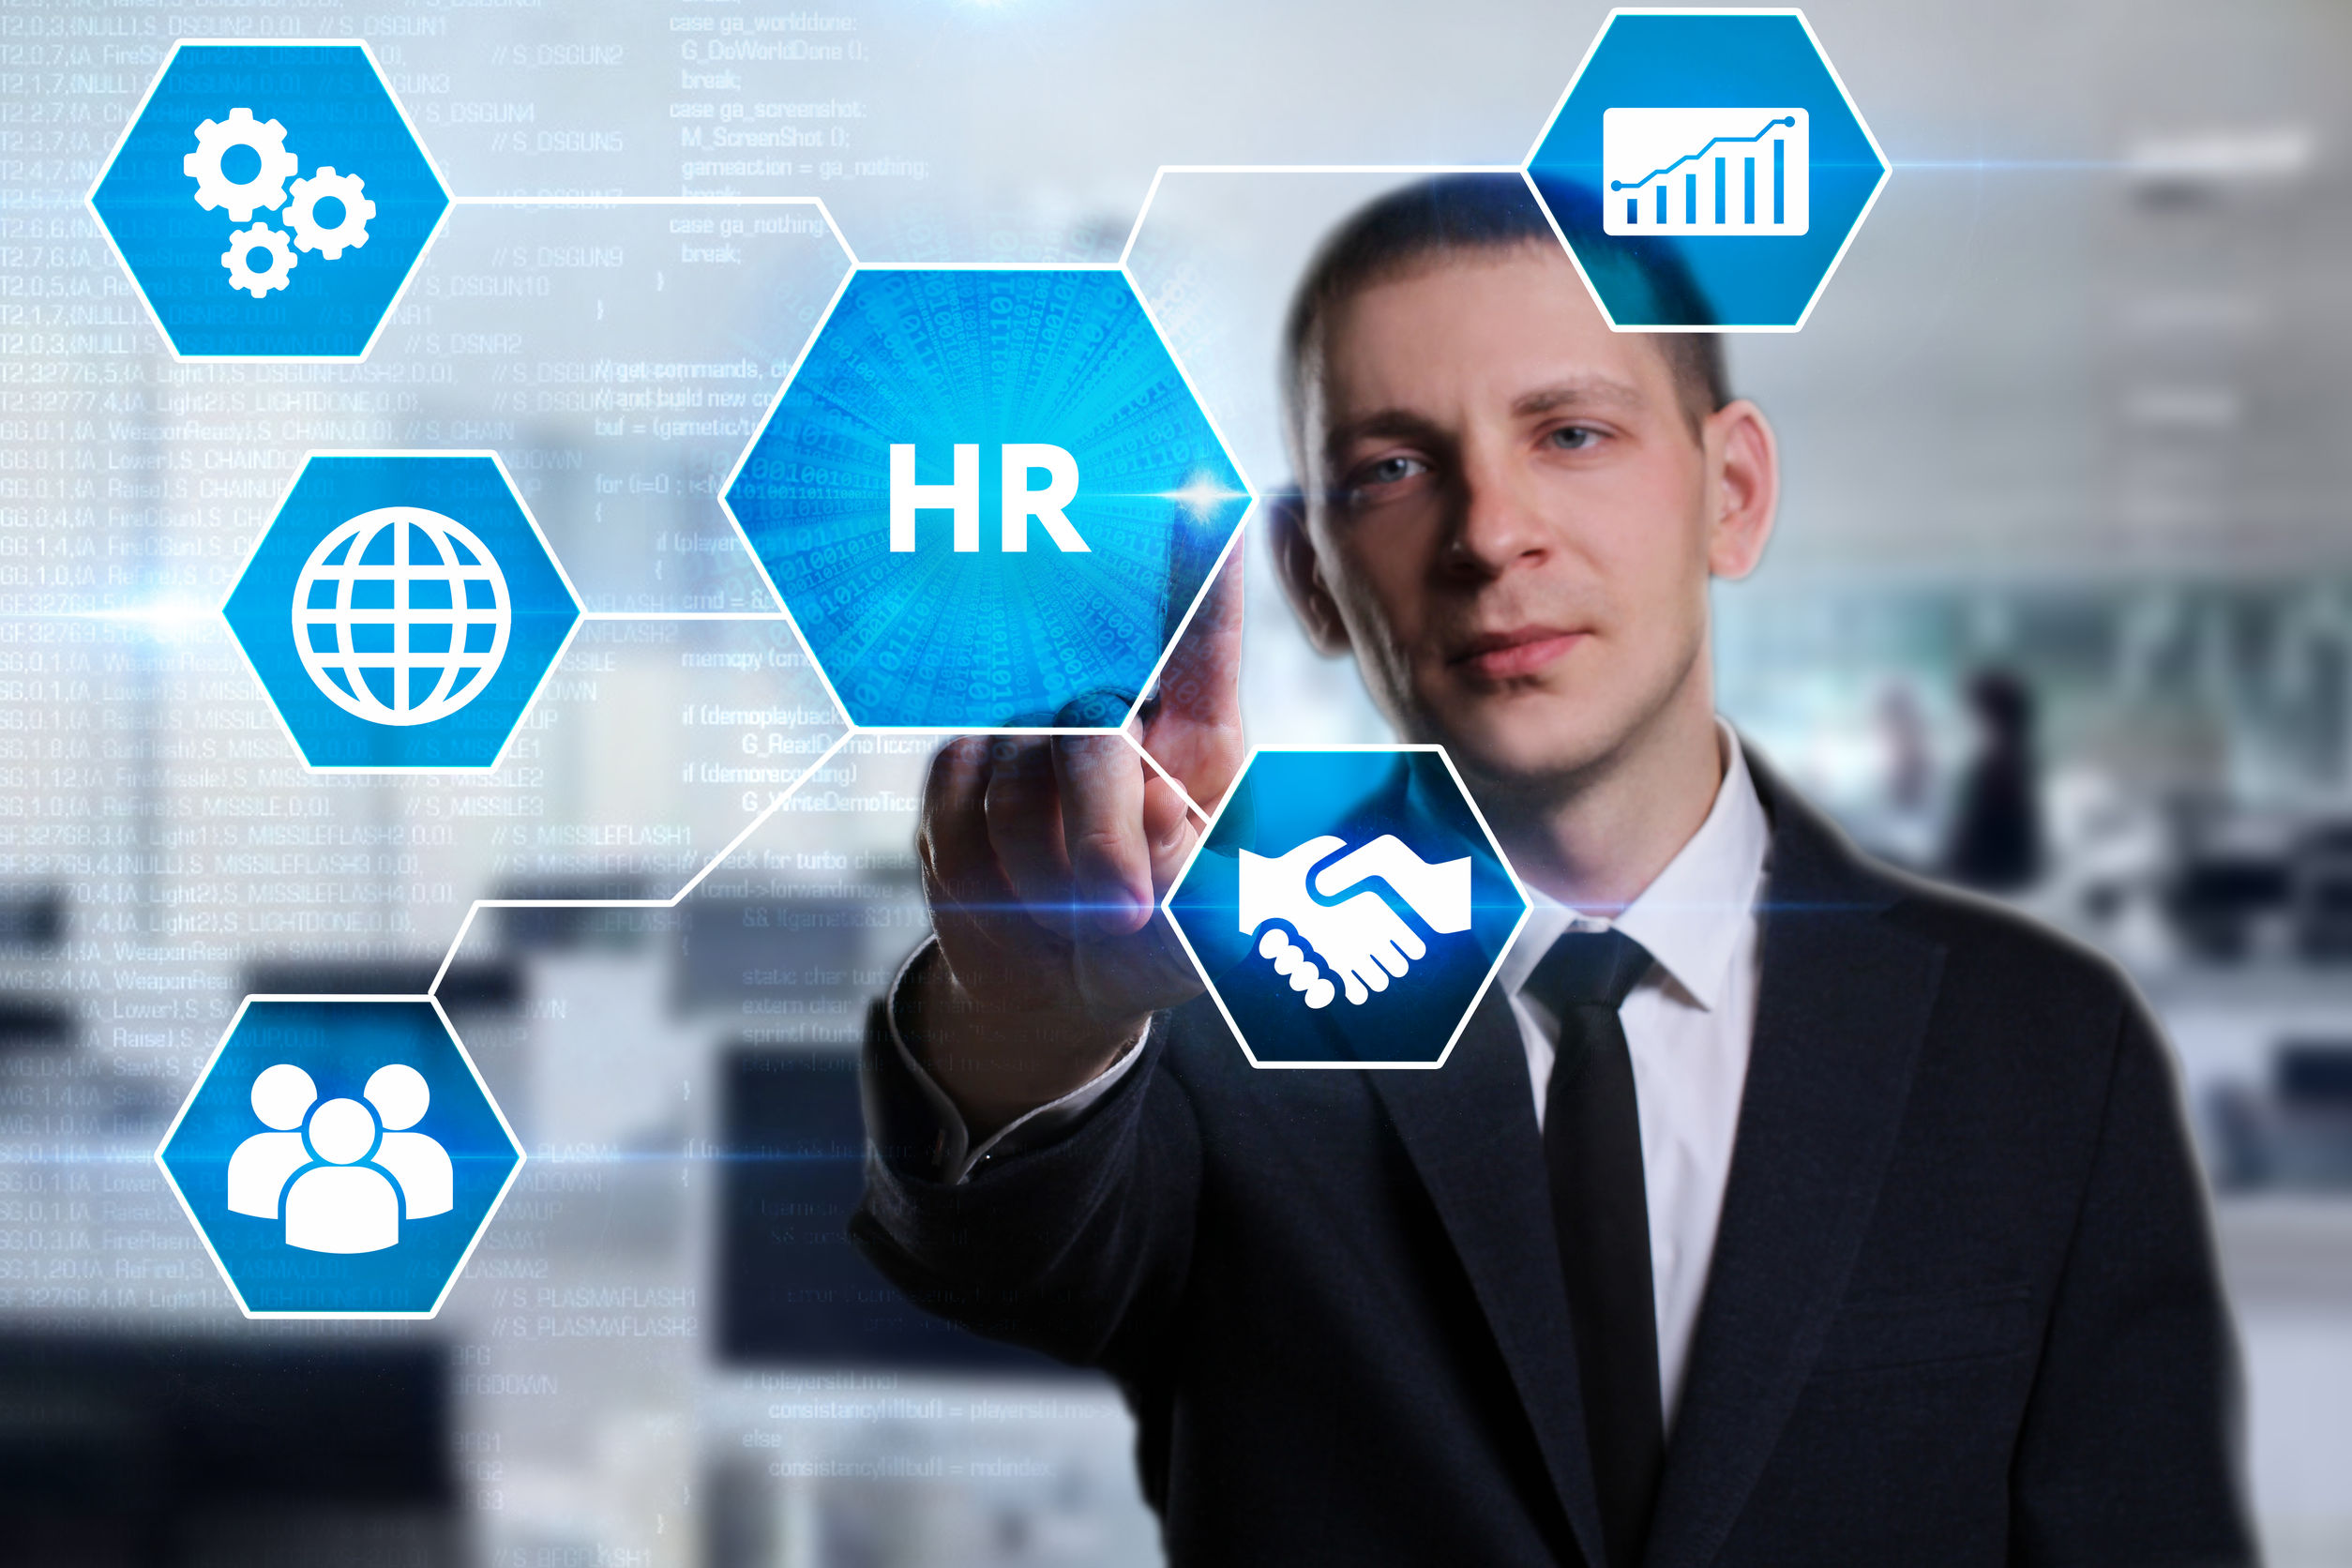 Use SMS to Streamline HR Processes